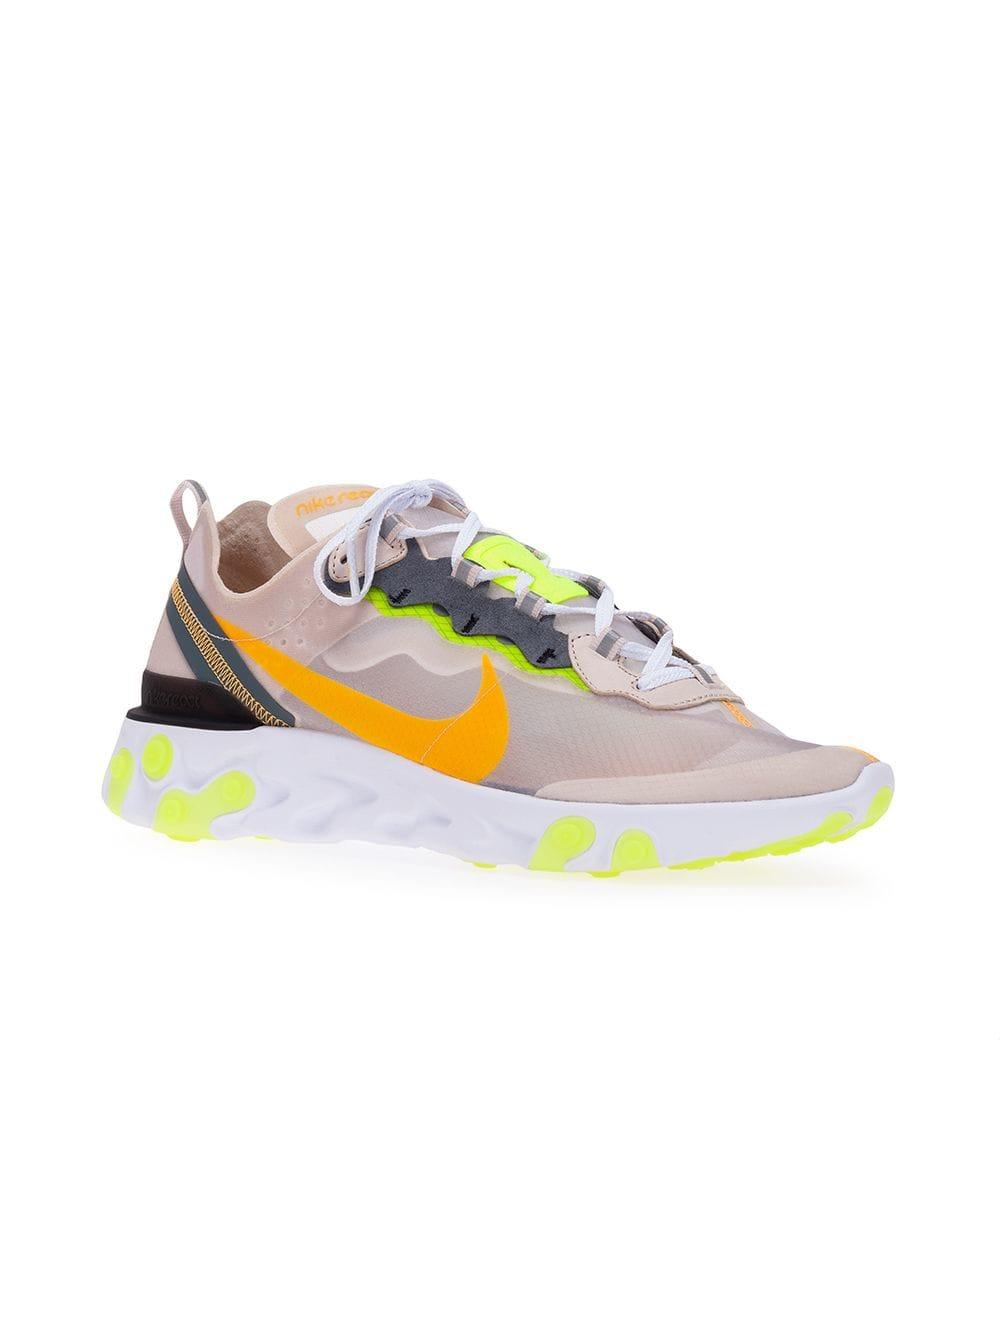 c73fff62b59b Lyst - Nike React Element 87 Sneakers for Men